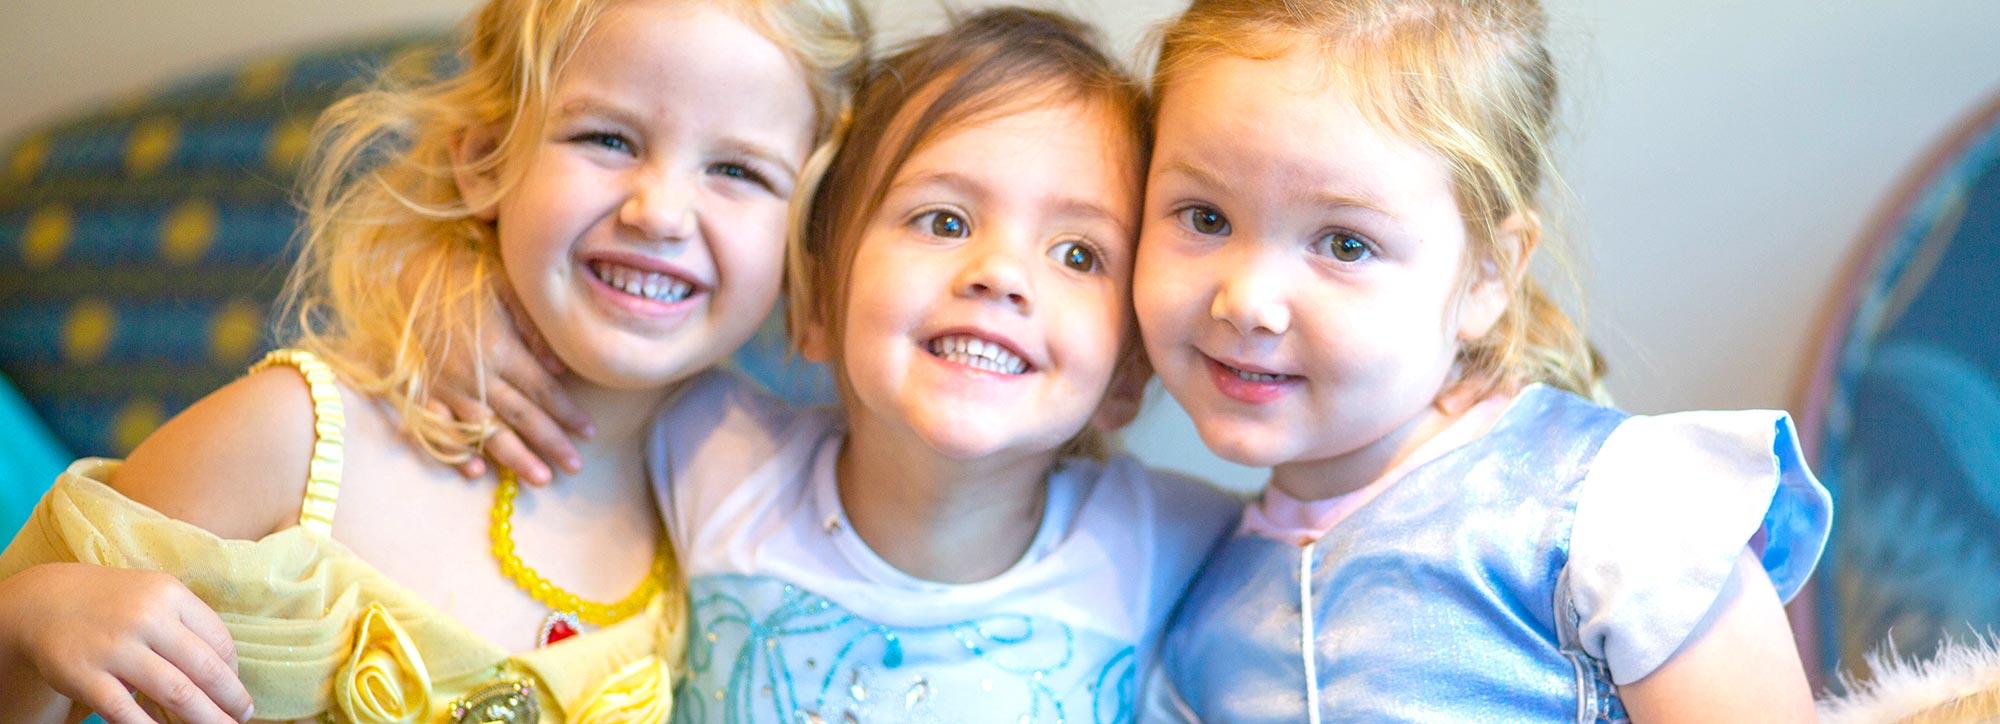 Child Care Program San Diego